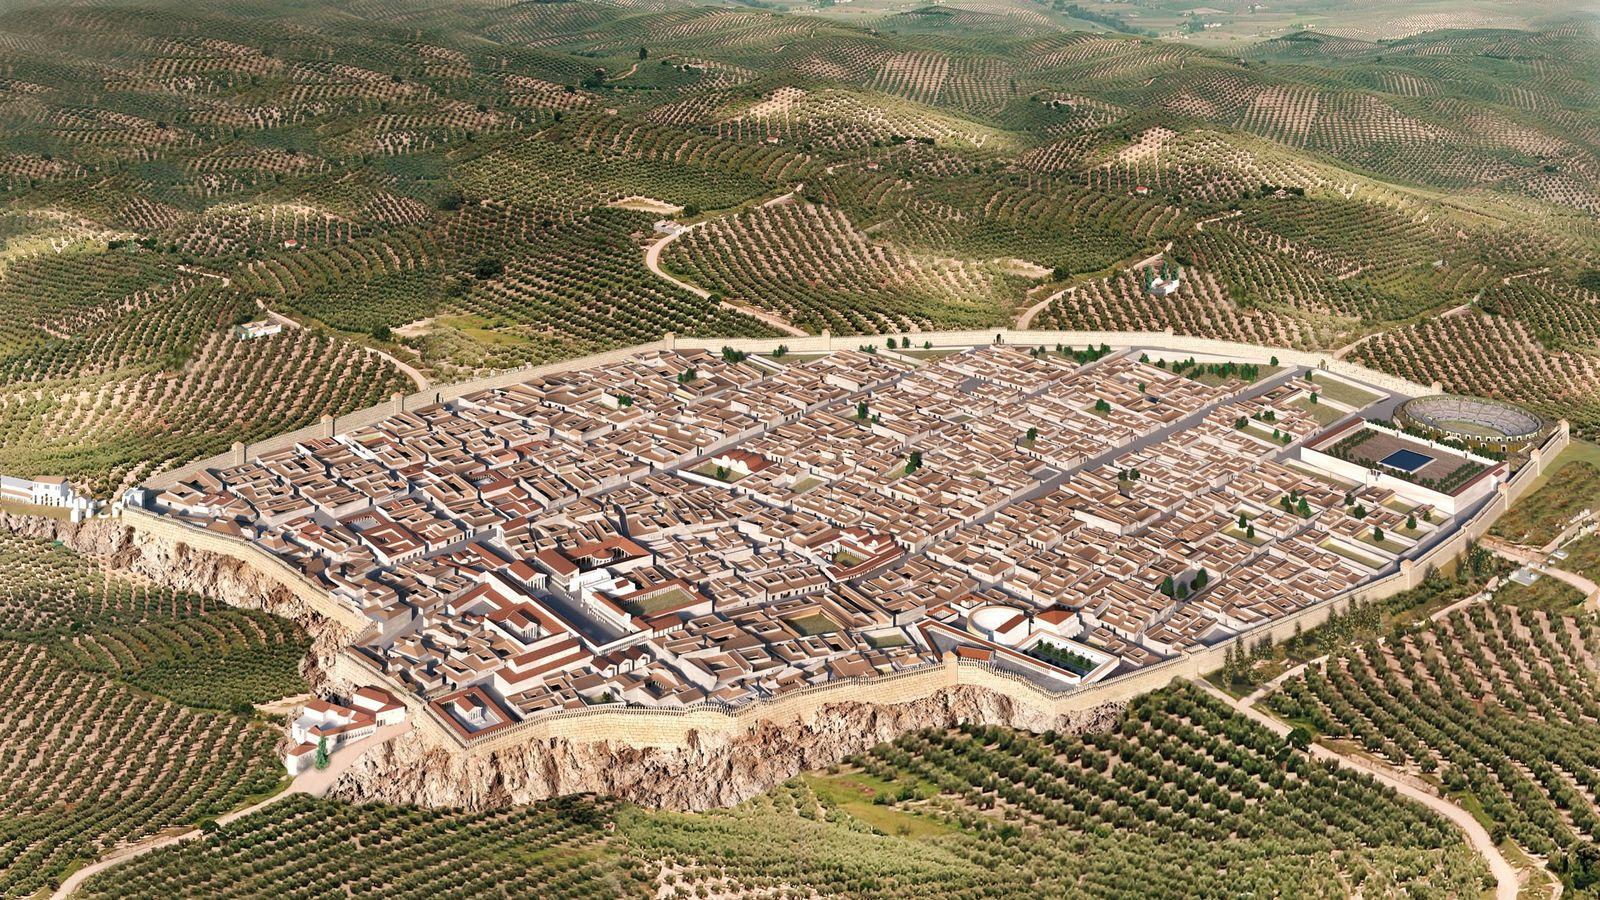 The excavation of Region V, wedged between Via del Vesuvio and Via di Nola and covering ...